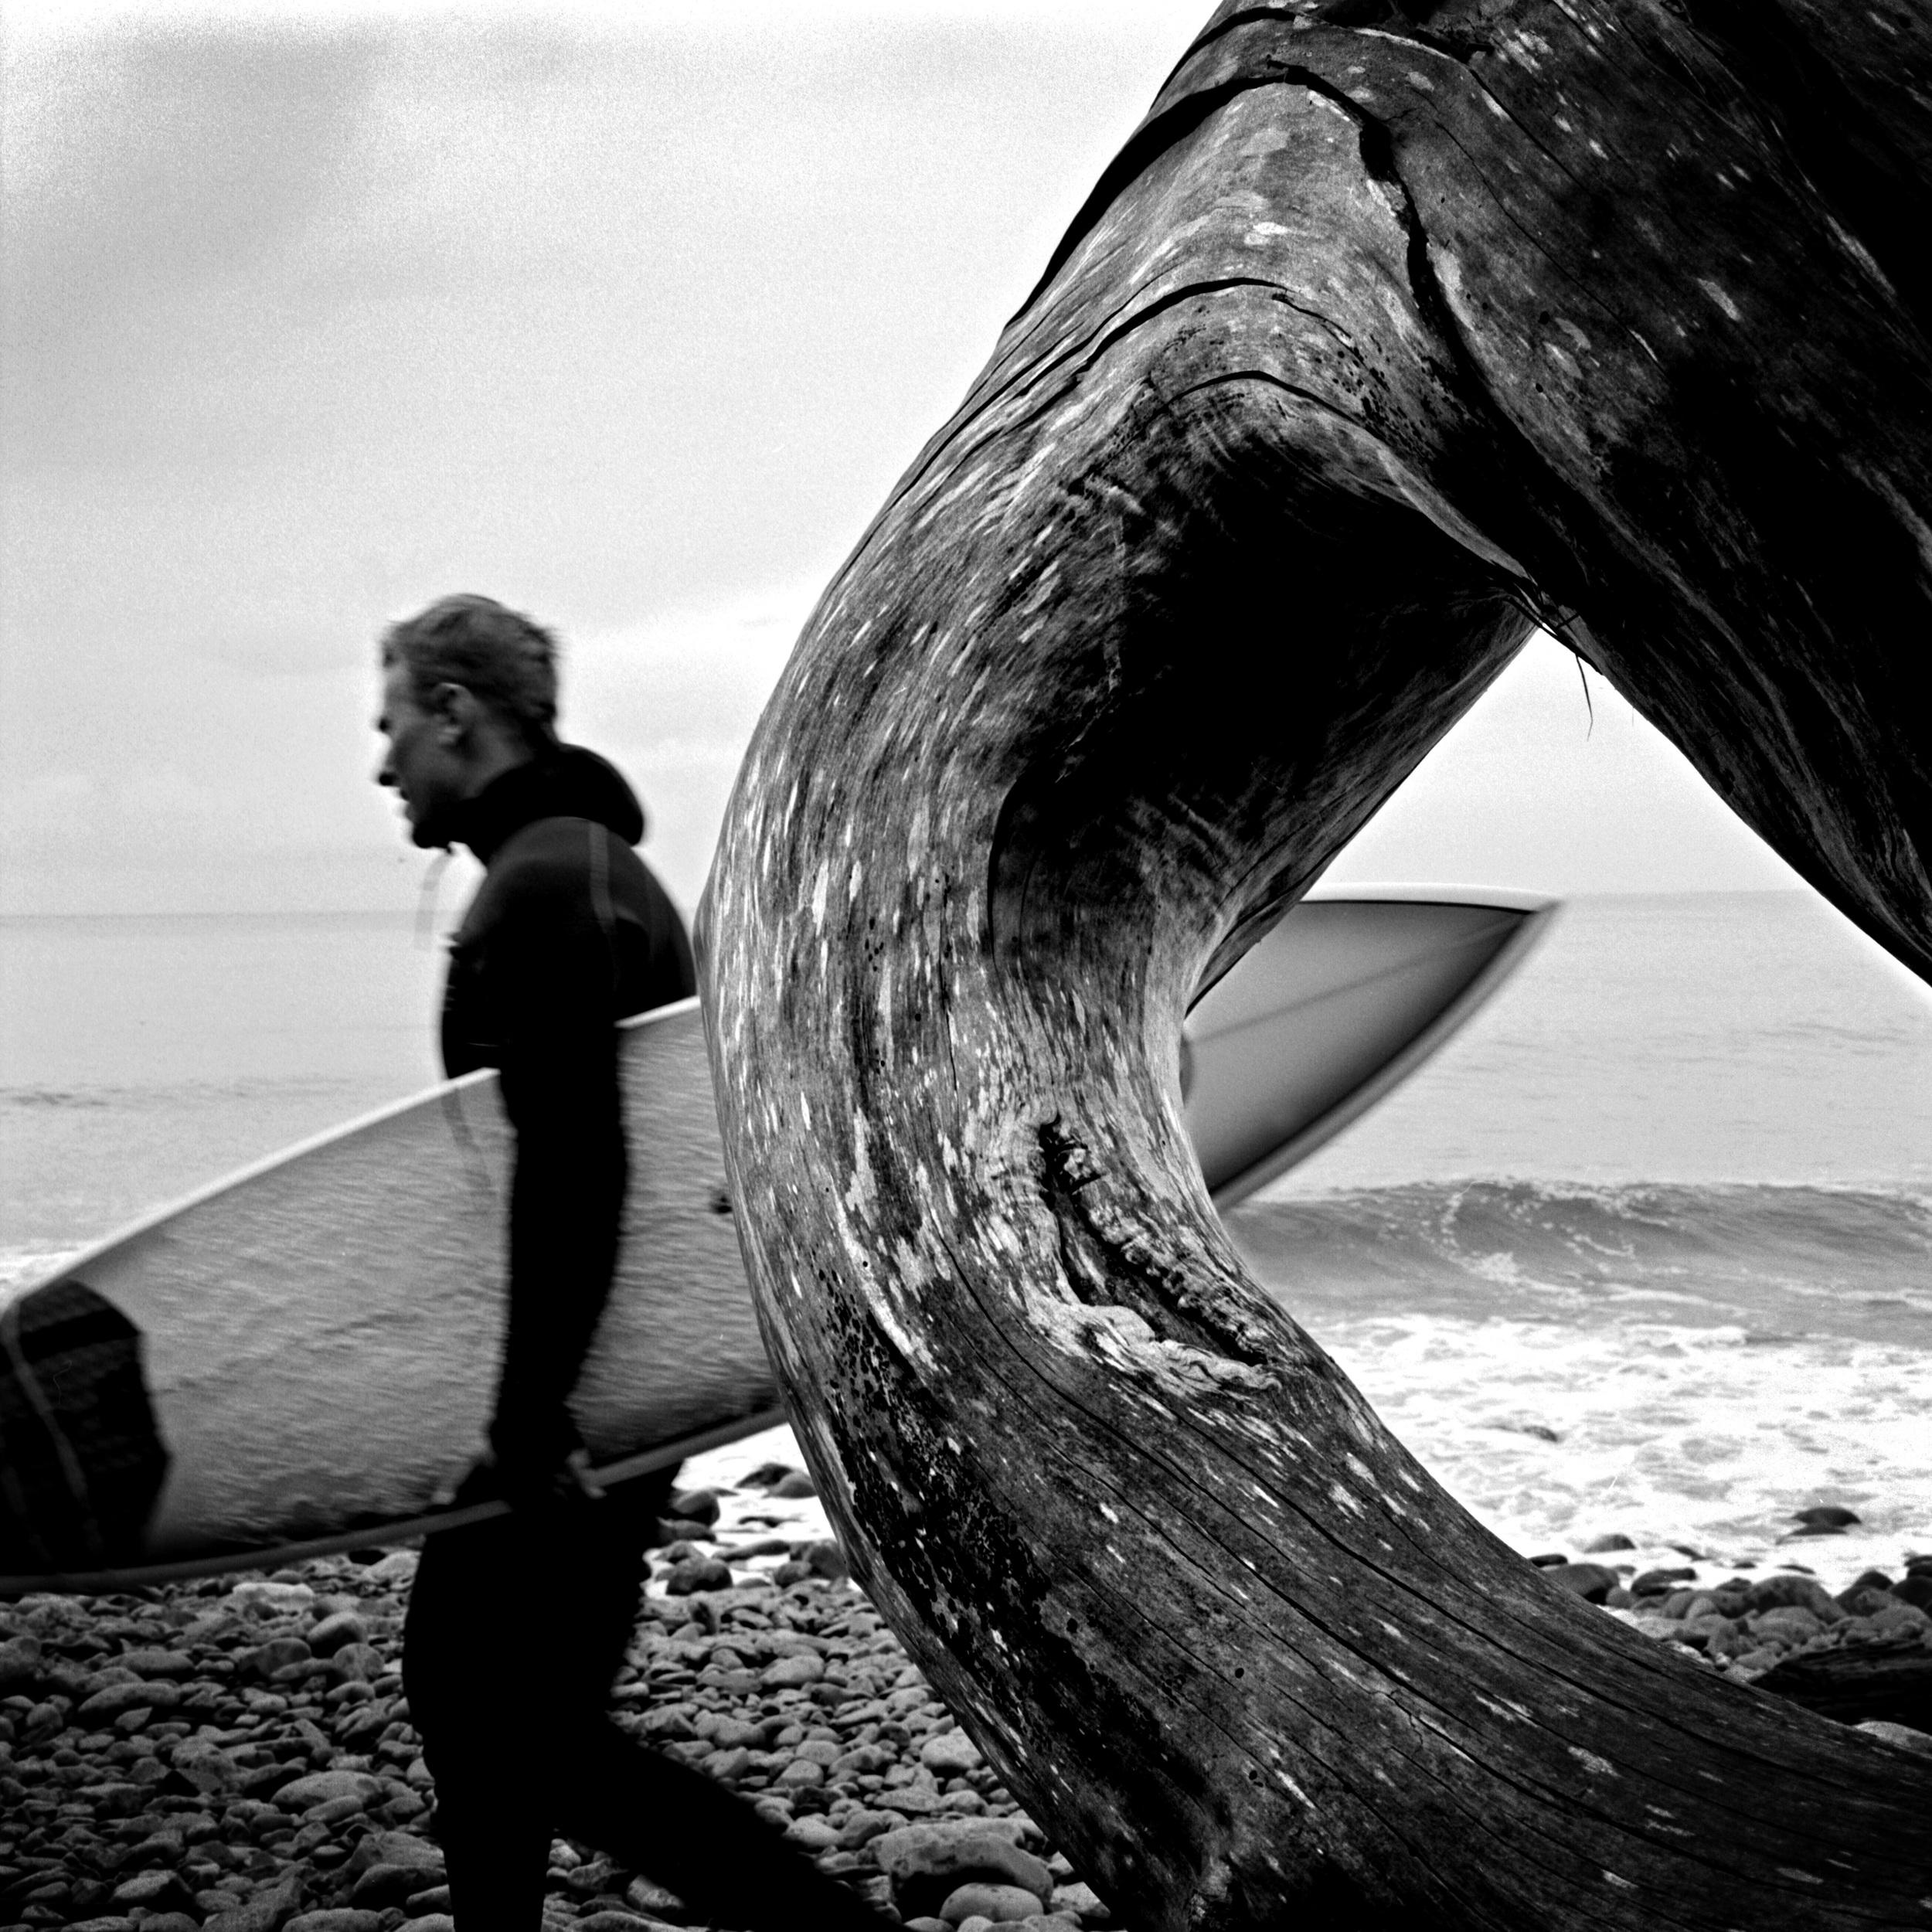 Winter surfing along the Oregon coast.